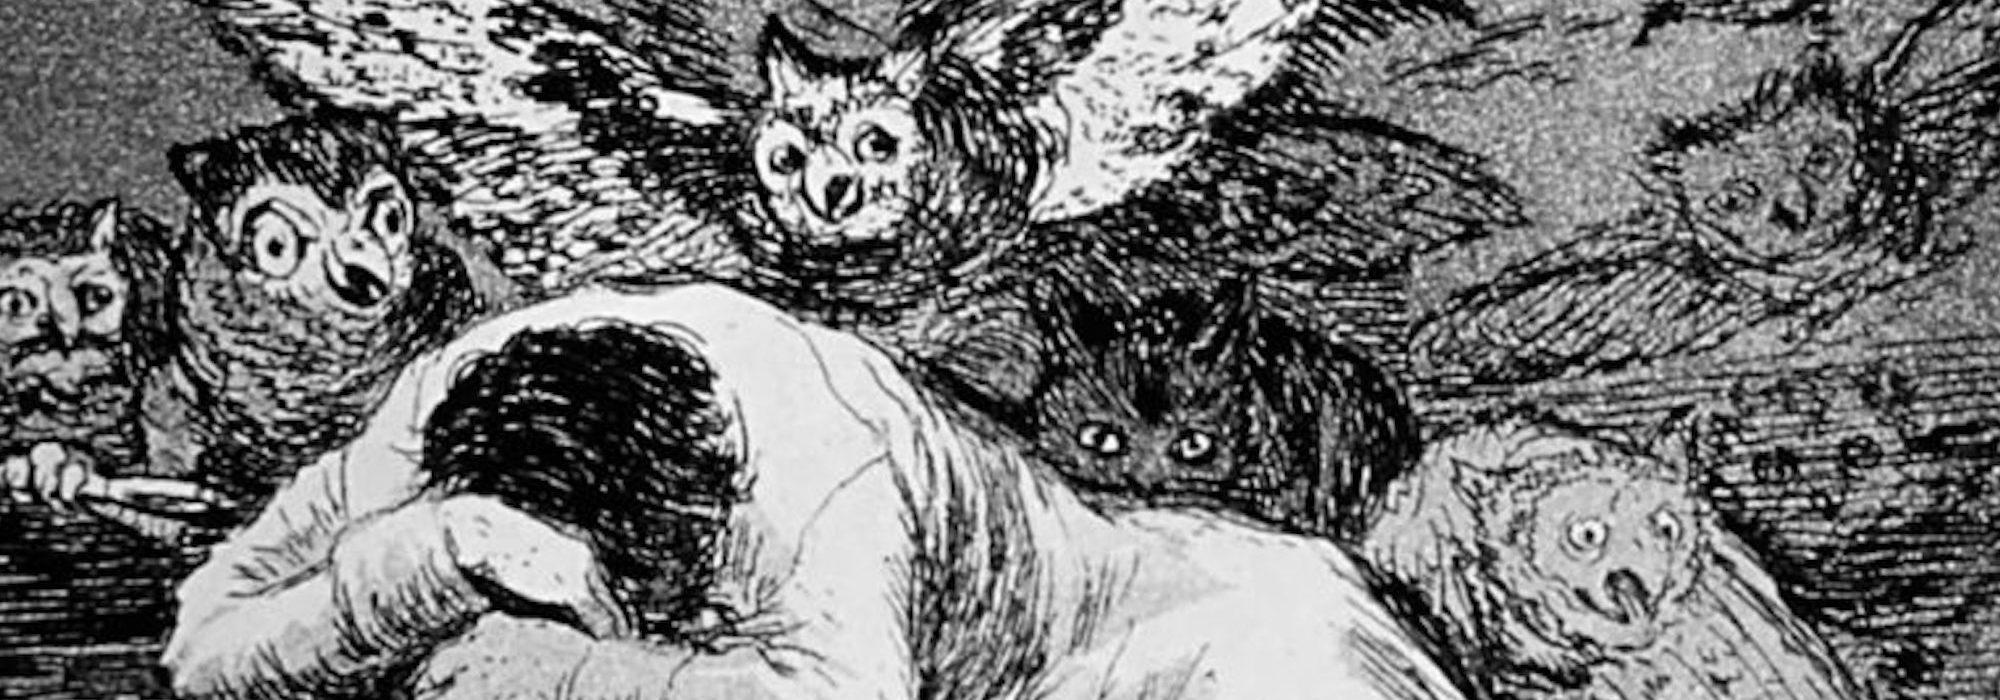 O Sono da Razão Produz Monstros - Goya